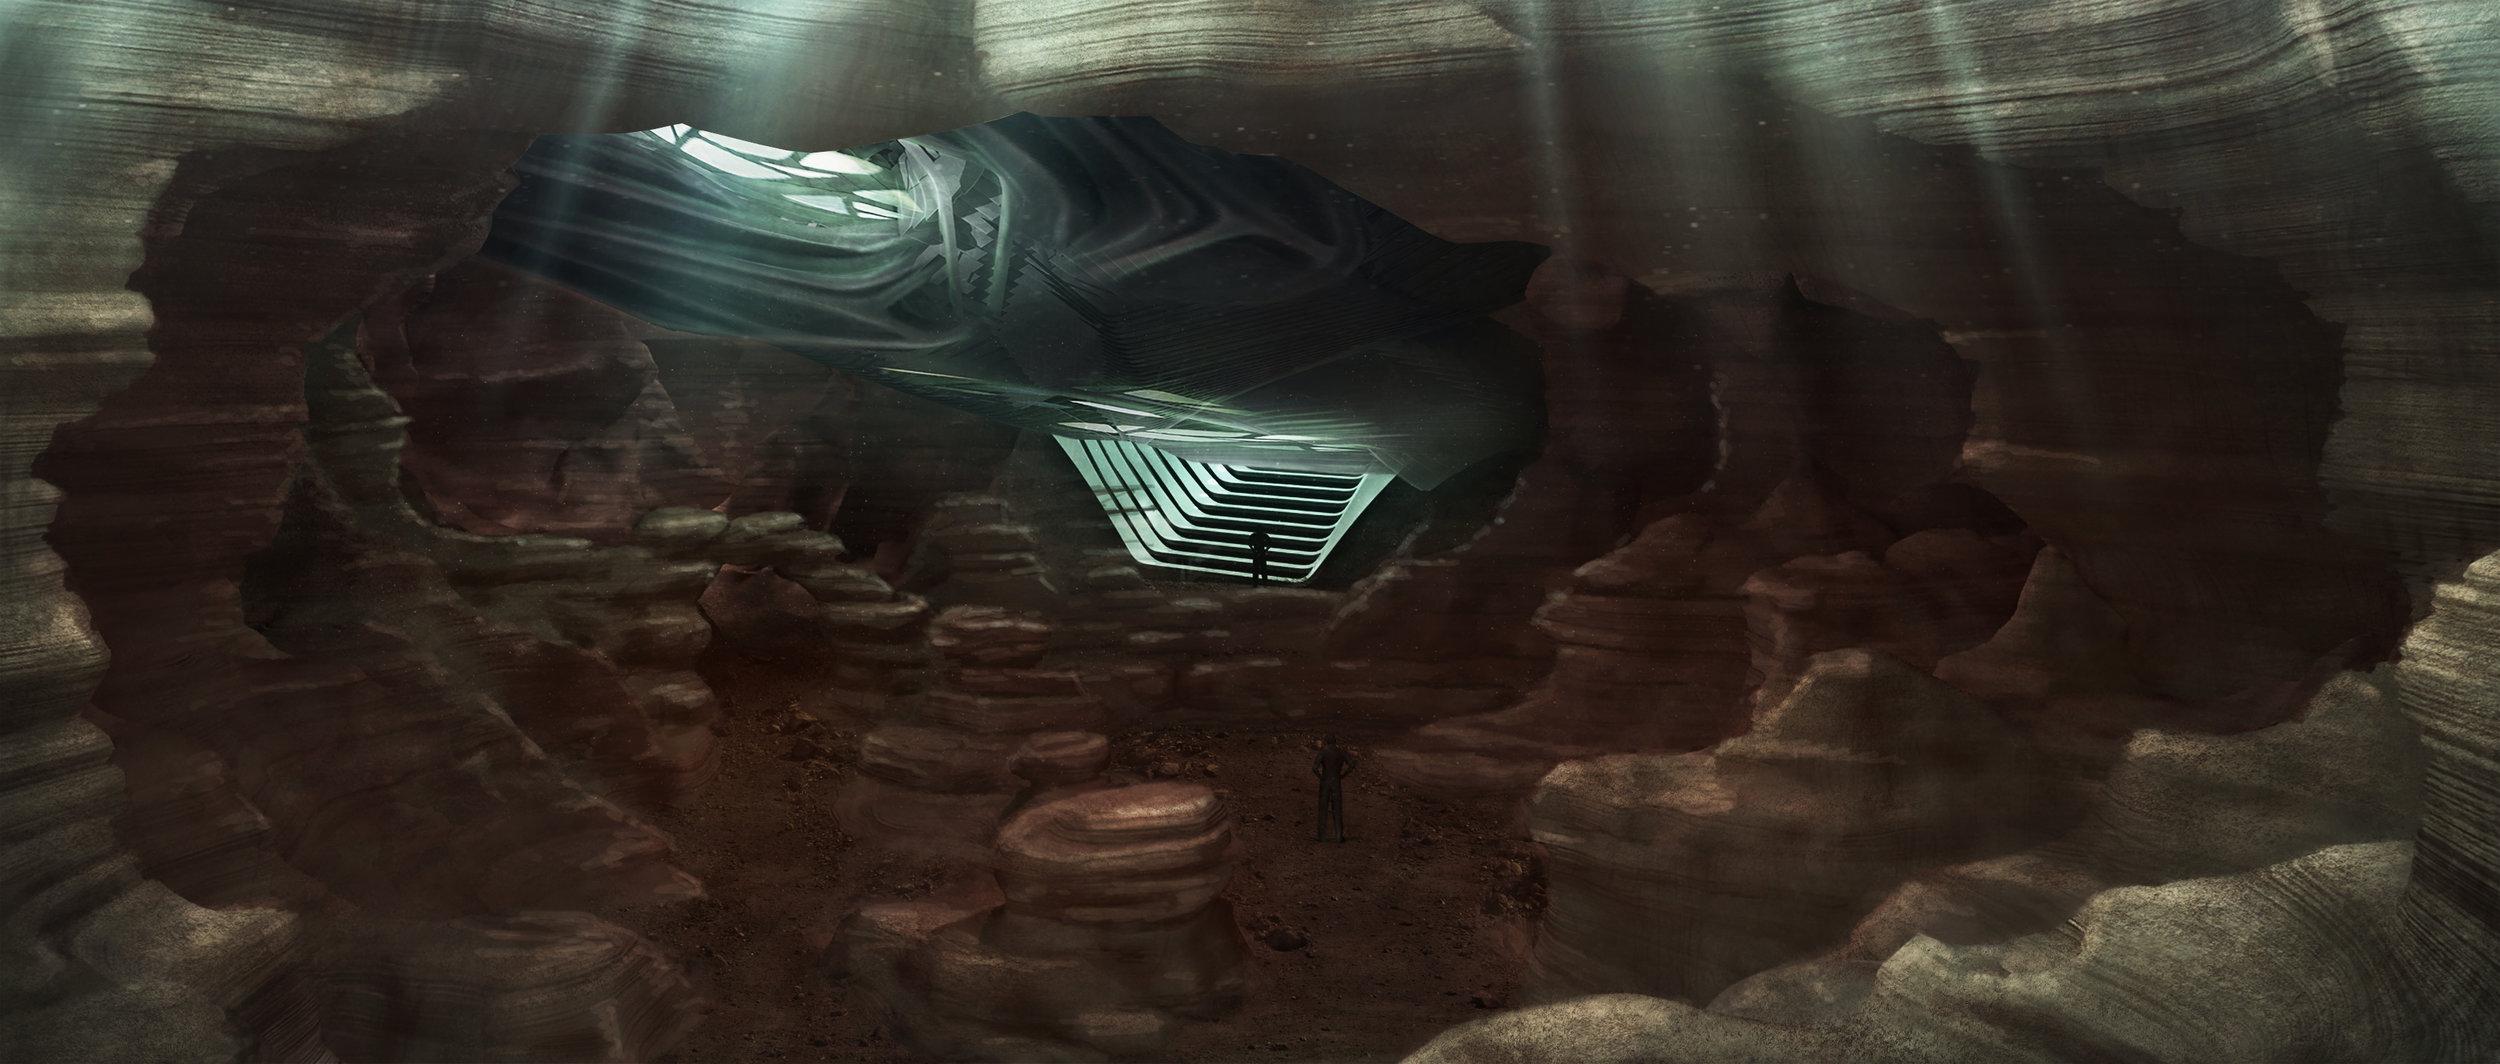 Power Rangers Cavern Concept by Stevo Bedford